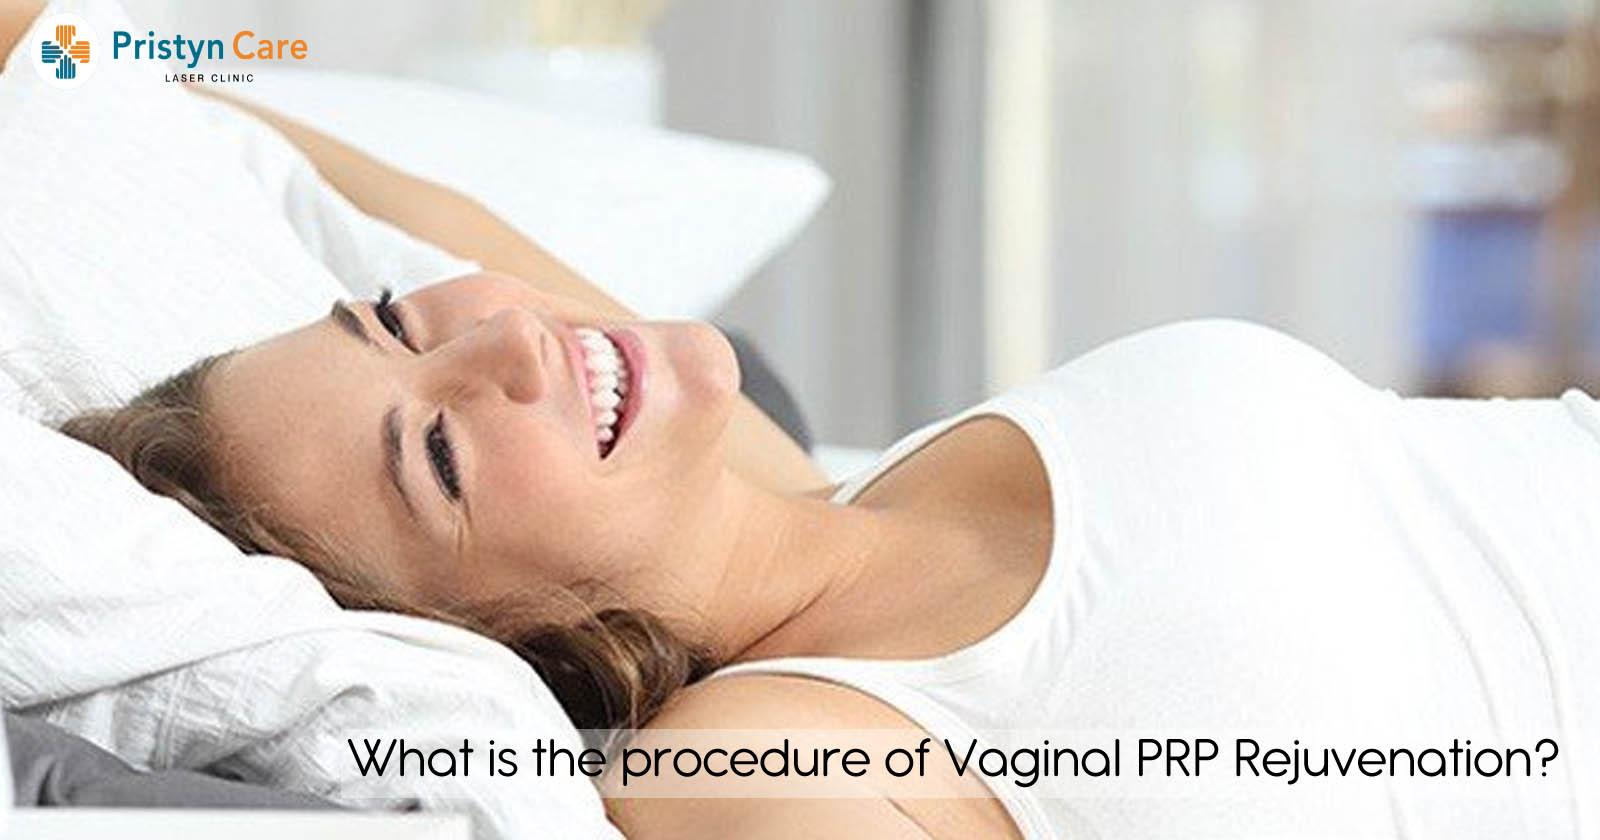 What is the procedure of Vaginal PRP Rejuvenation?